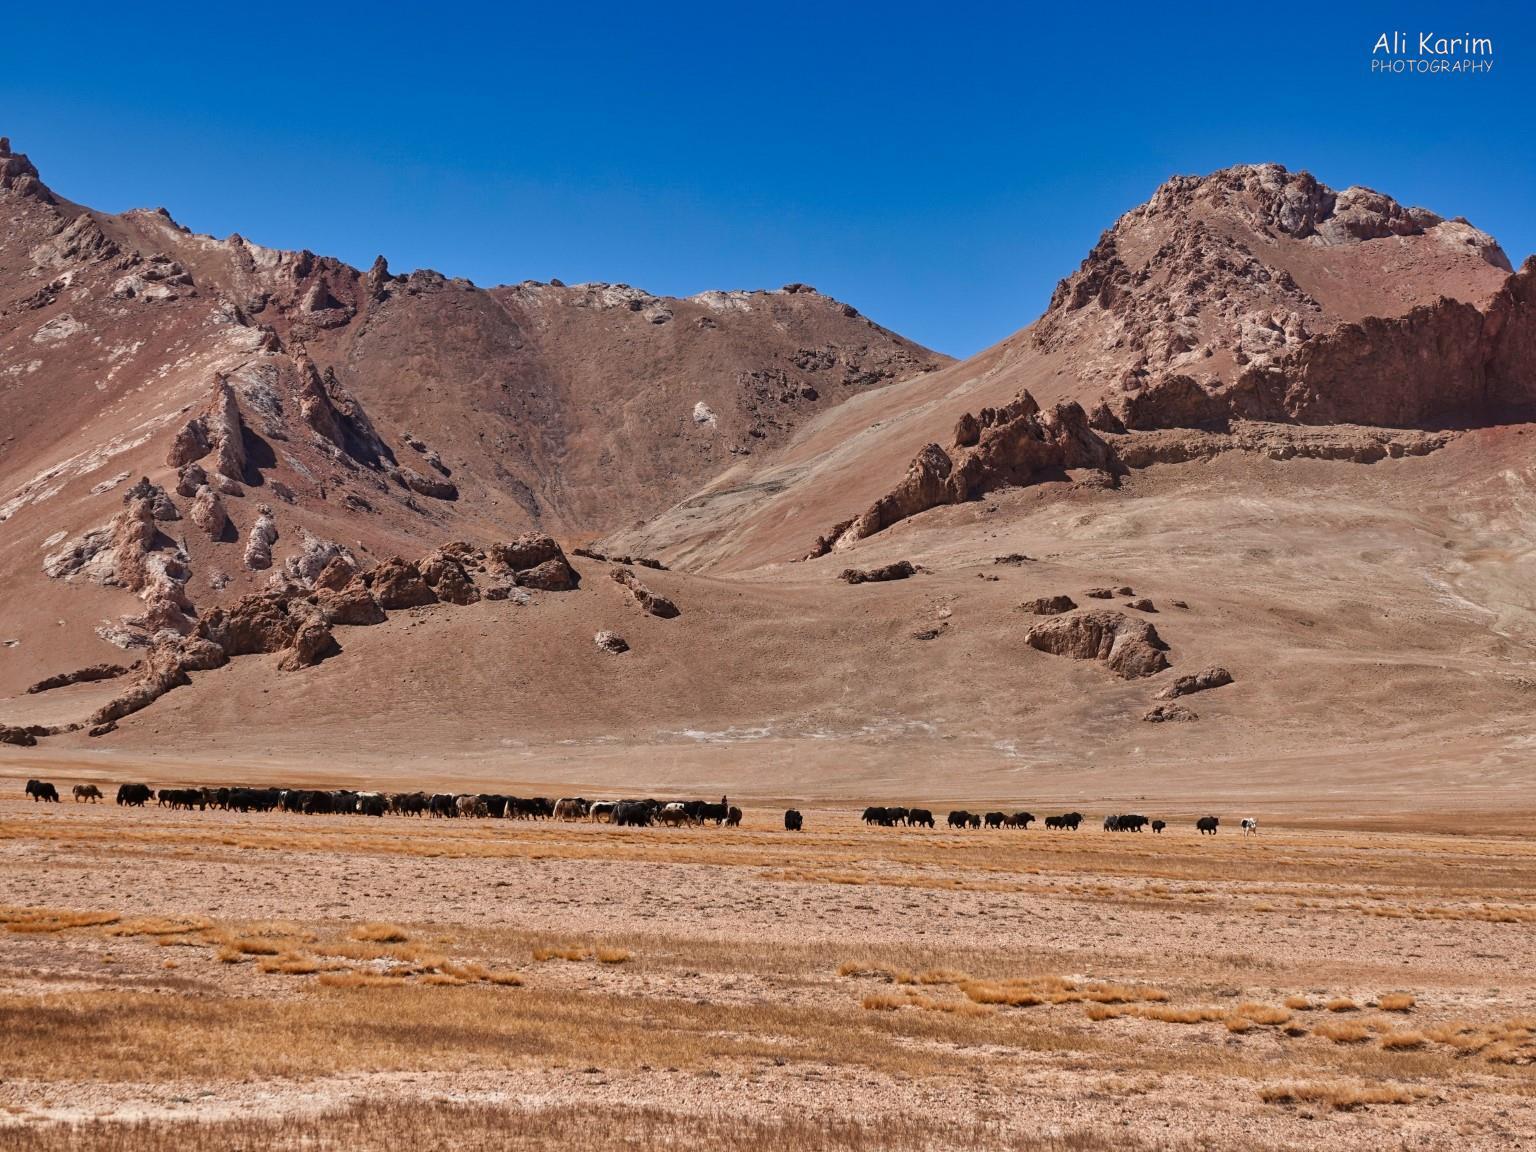 More Murghab & Alichur, Tajikistan, Yaks grazing with herdsman